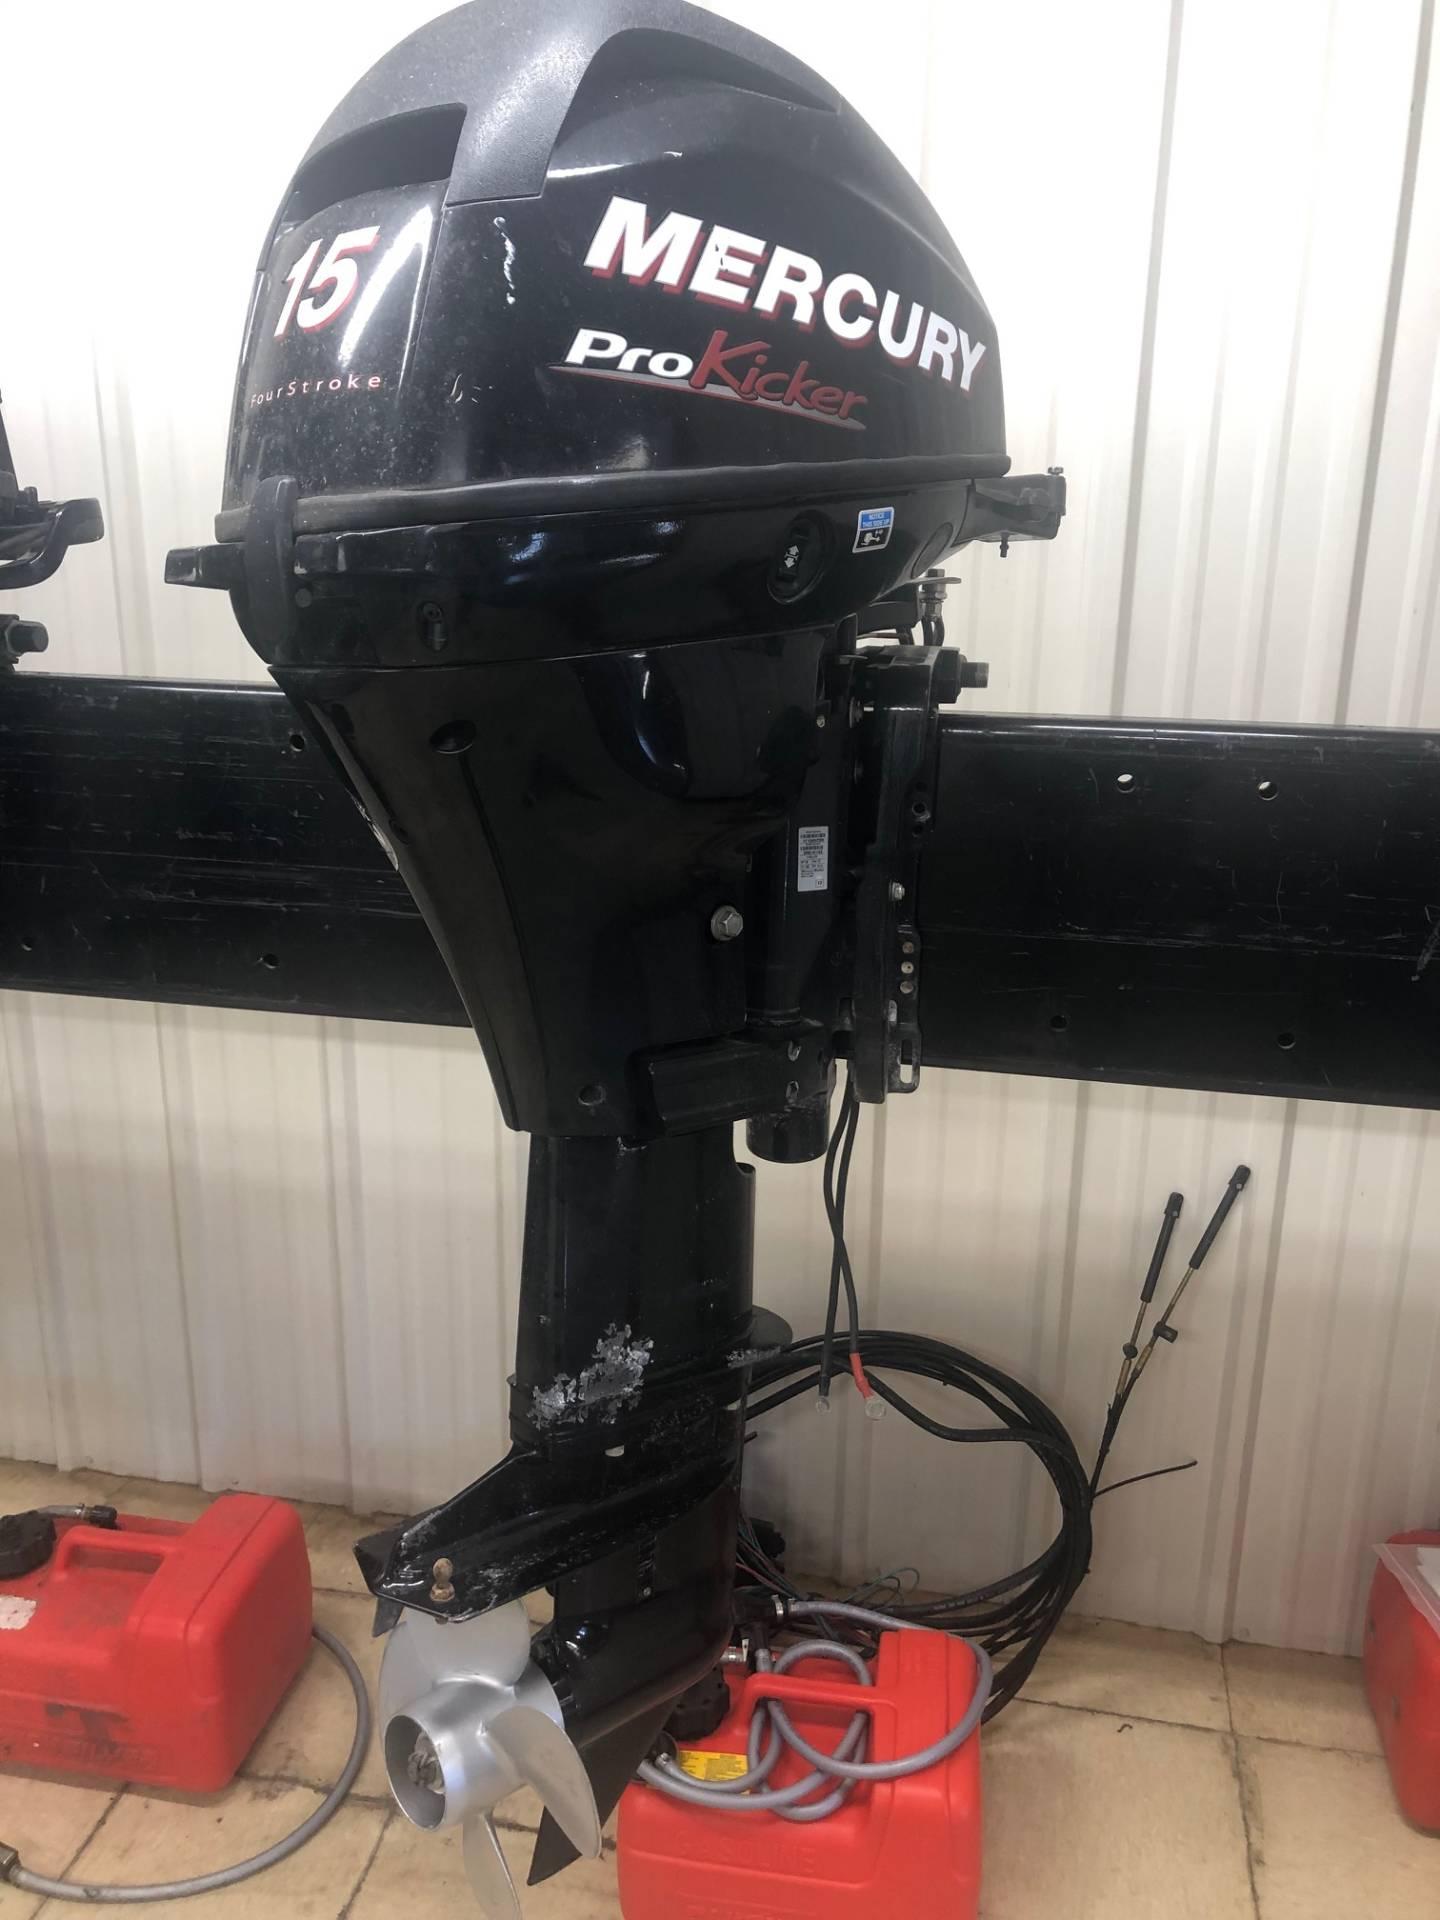 Used Mercury 15 Pro Kicker Boat Engines In Trego Wi N A